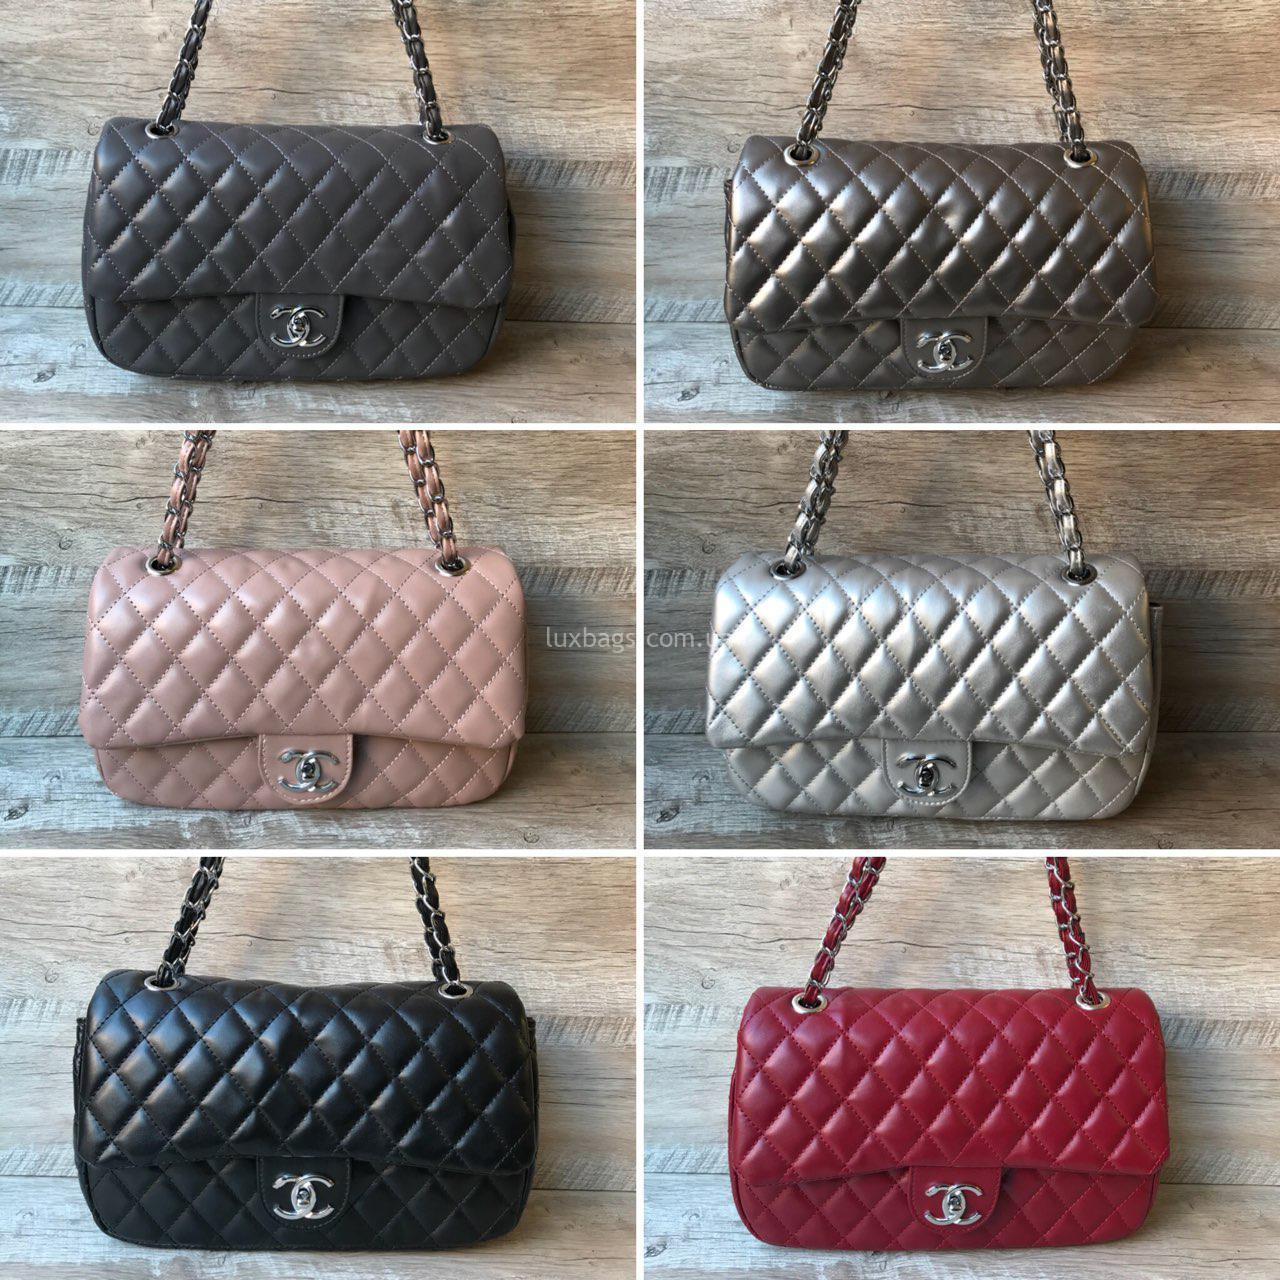 a2c0aa2e Женская сумка Chanel 2.55 (копия) | Женские сумки кроссбоди